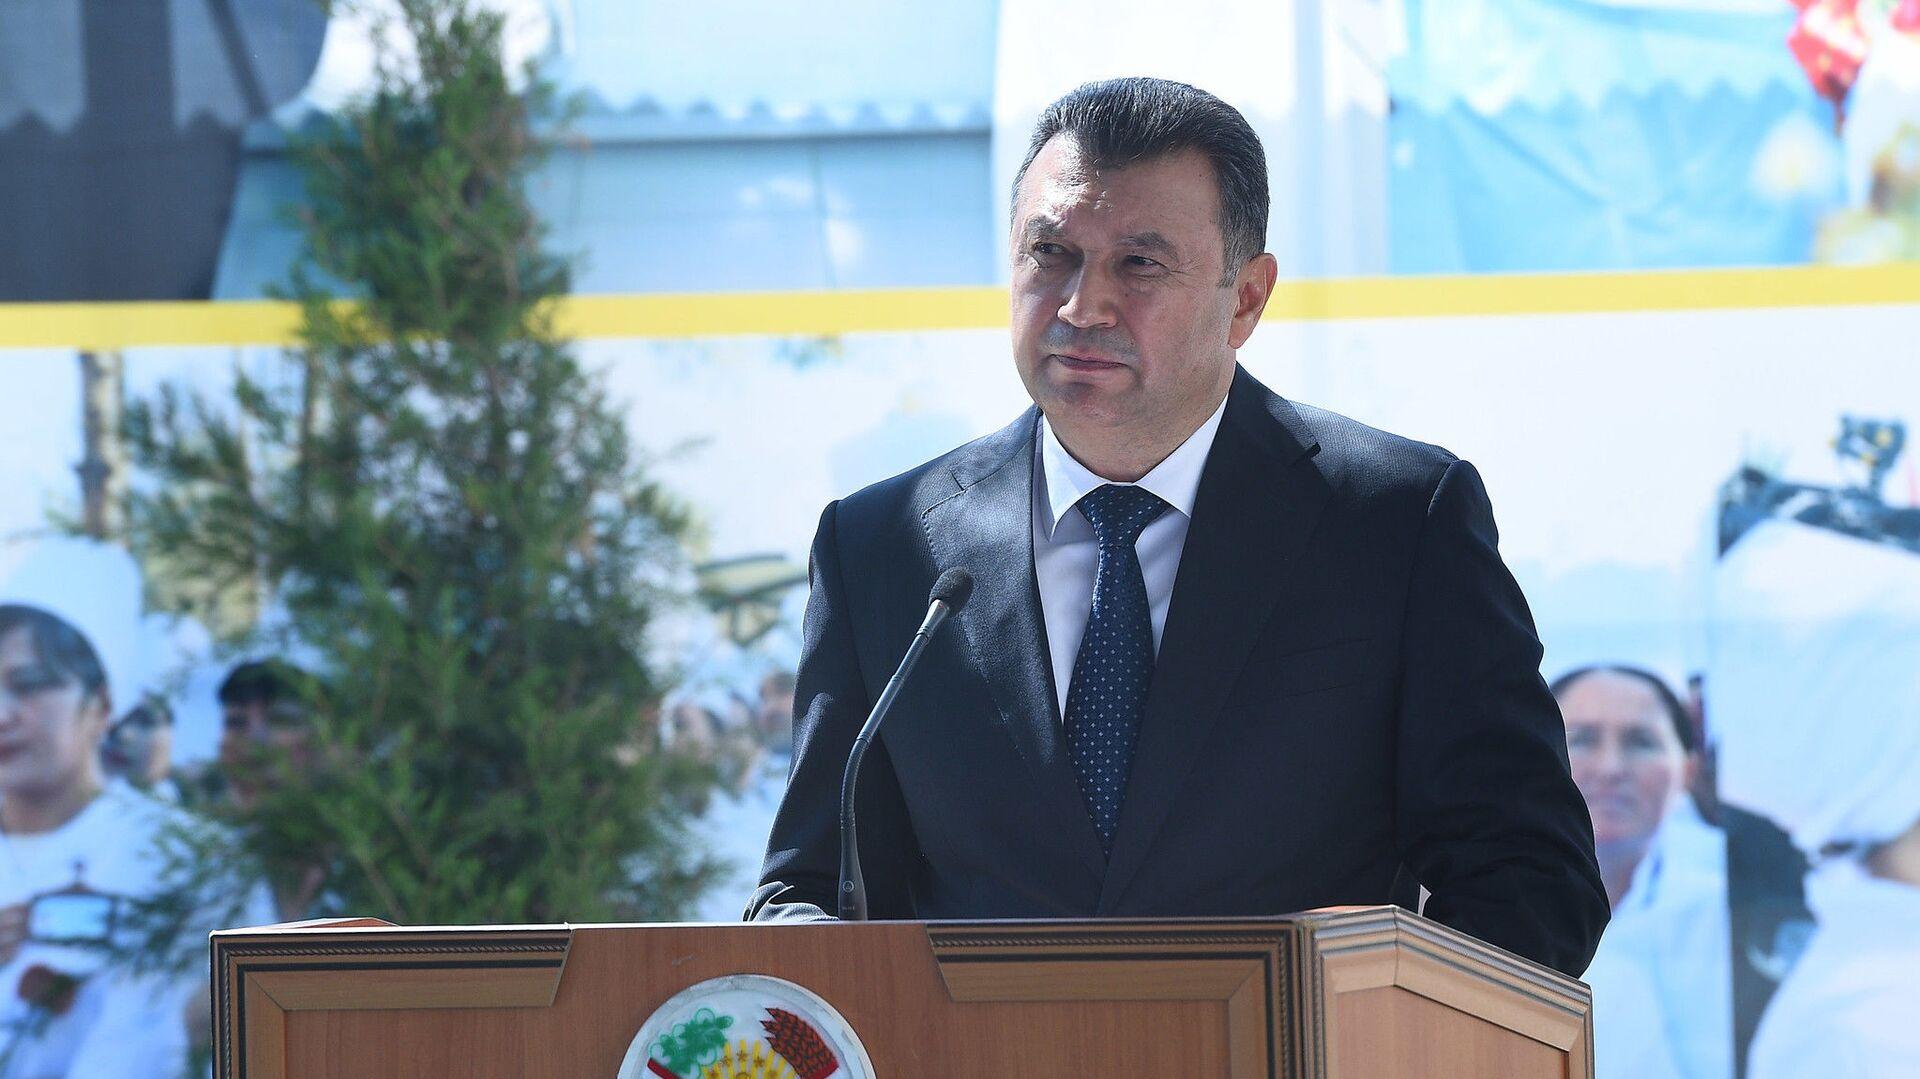 Премьер-министр Таджикистана Кохир Расулзода  - Sputnik Таджикистан, 1920, 06.09.2021